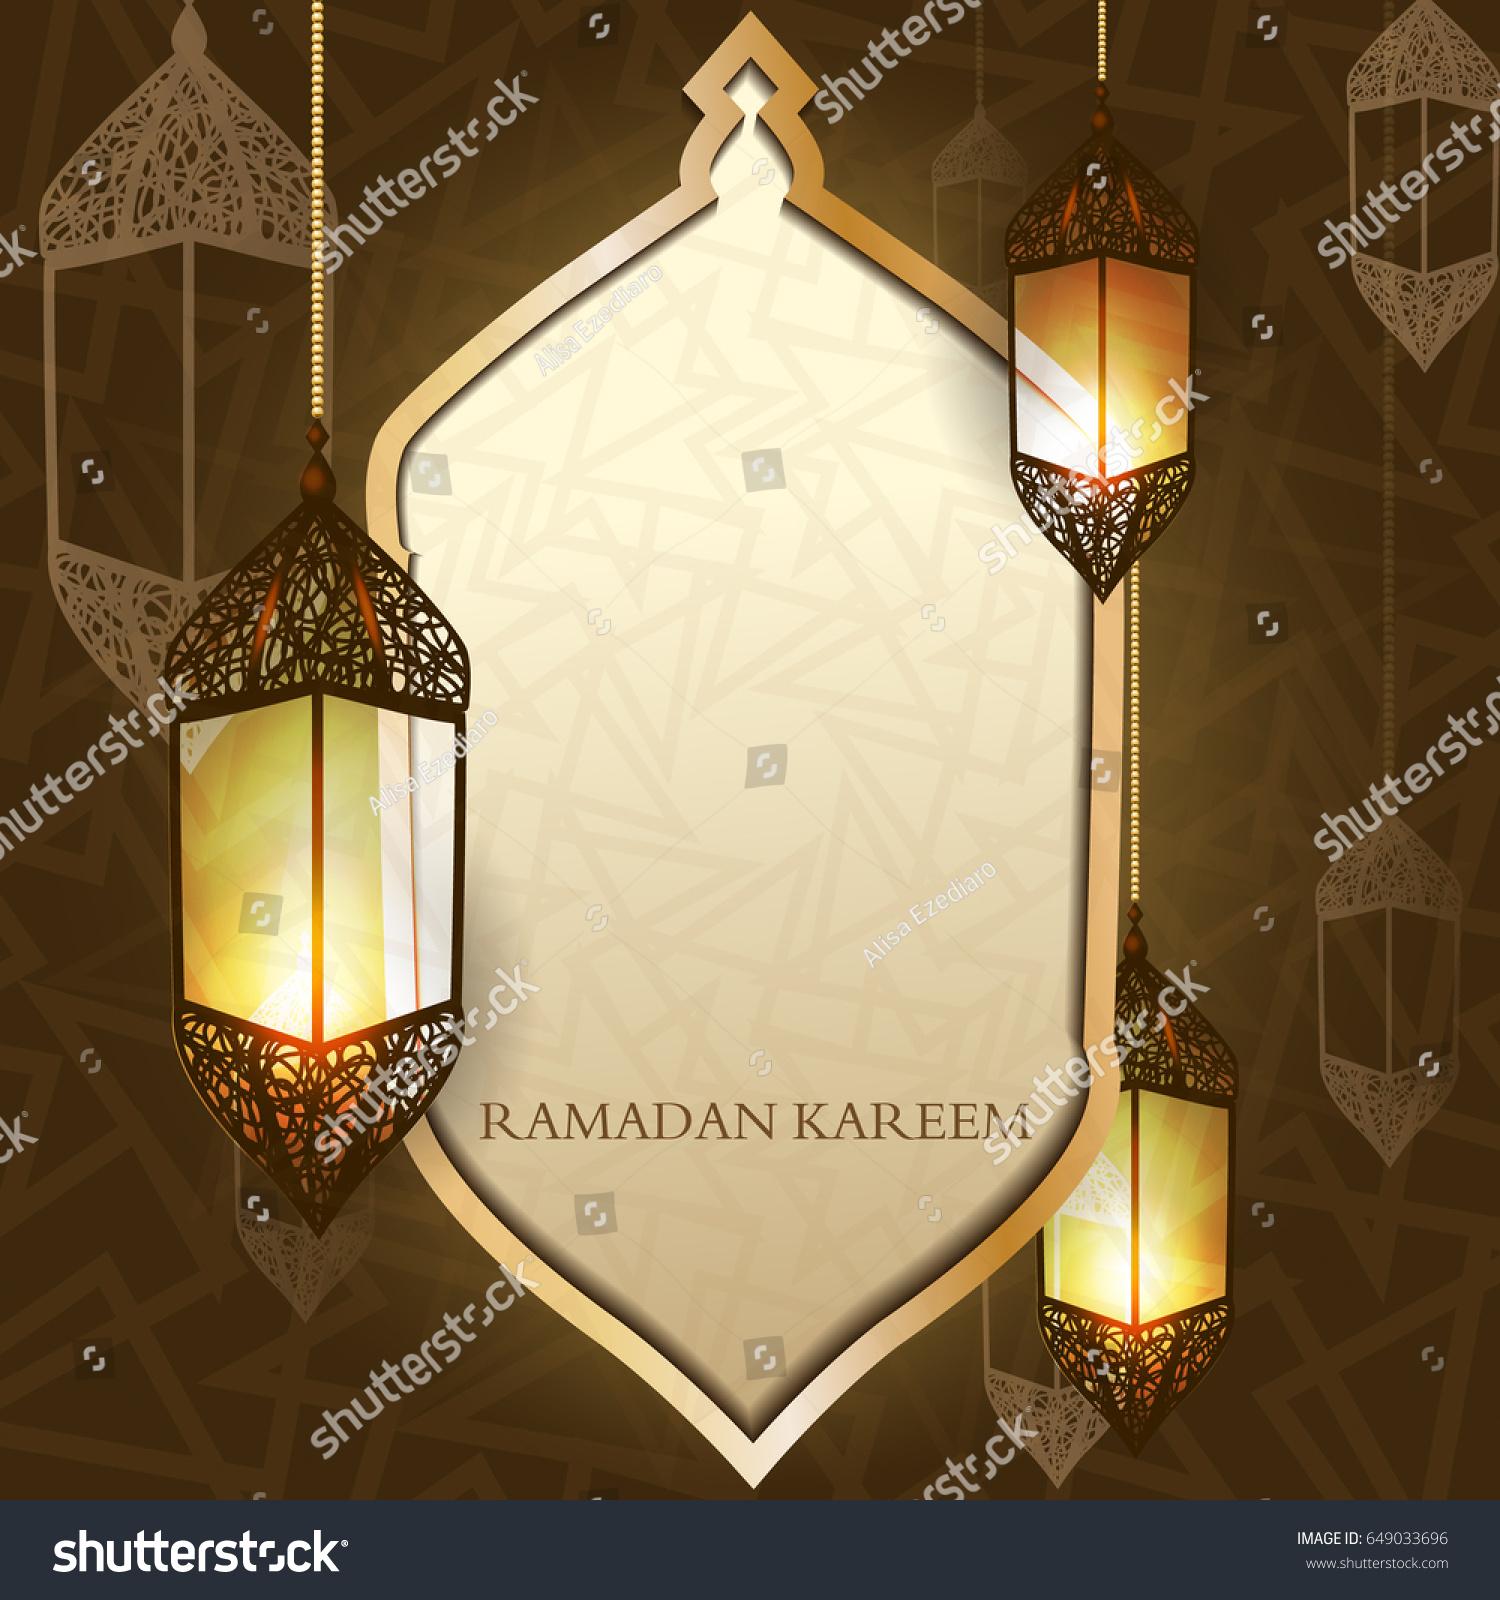 Arabic Design Ramadan Kareem On Lantern Stock Vector HD (Royalty ...